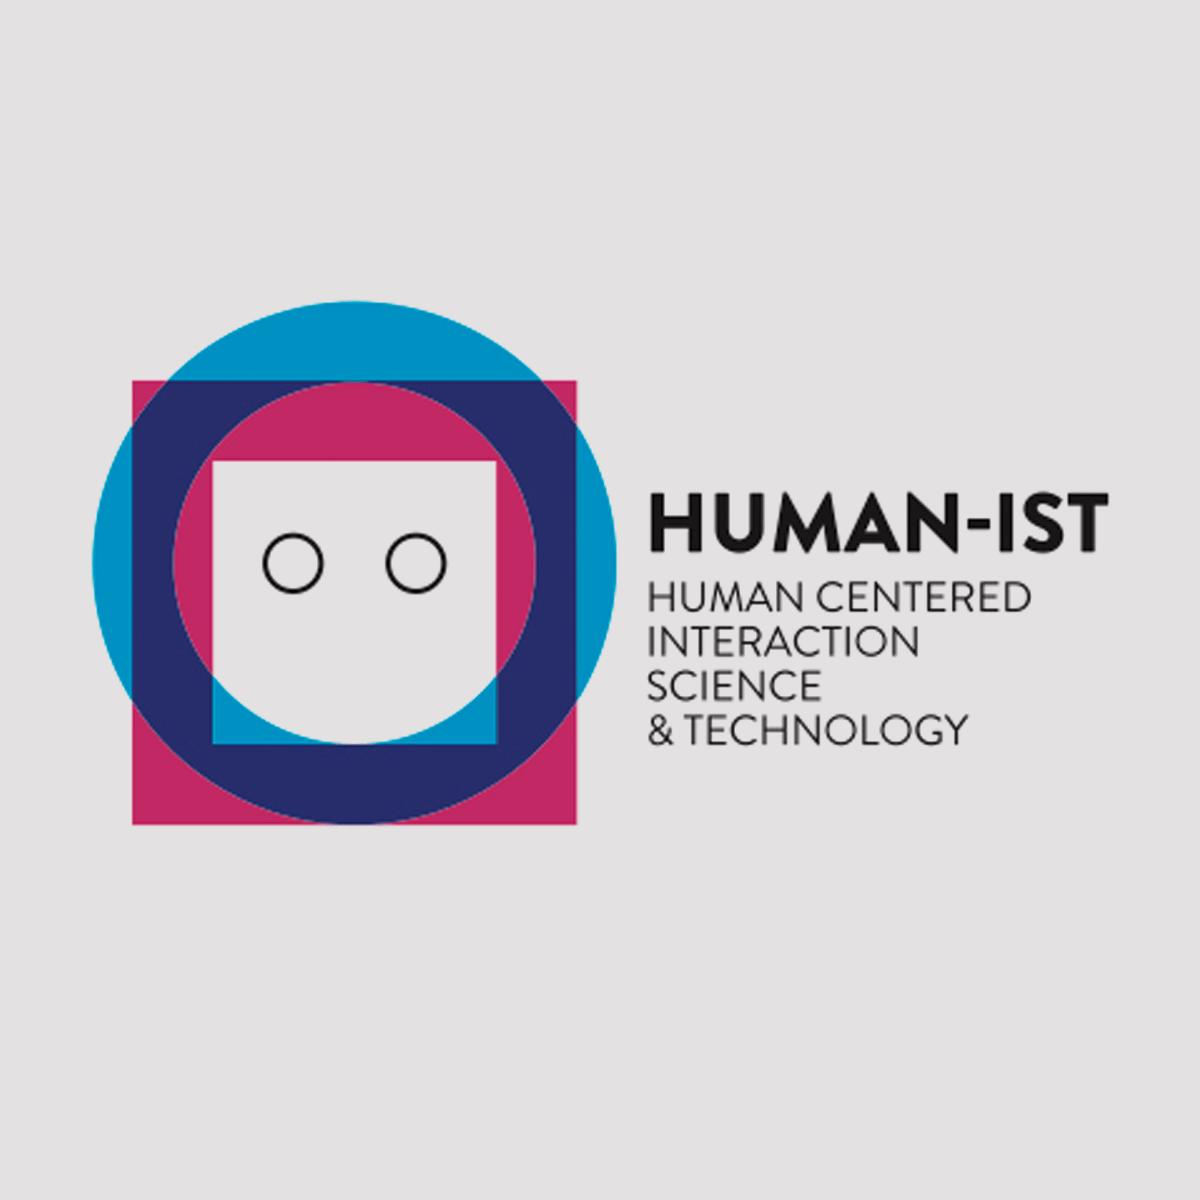 Human-ist_Logo_1200x1200px